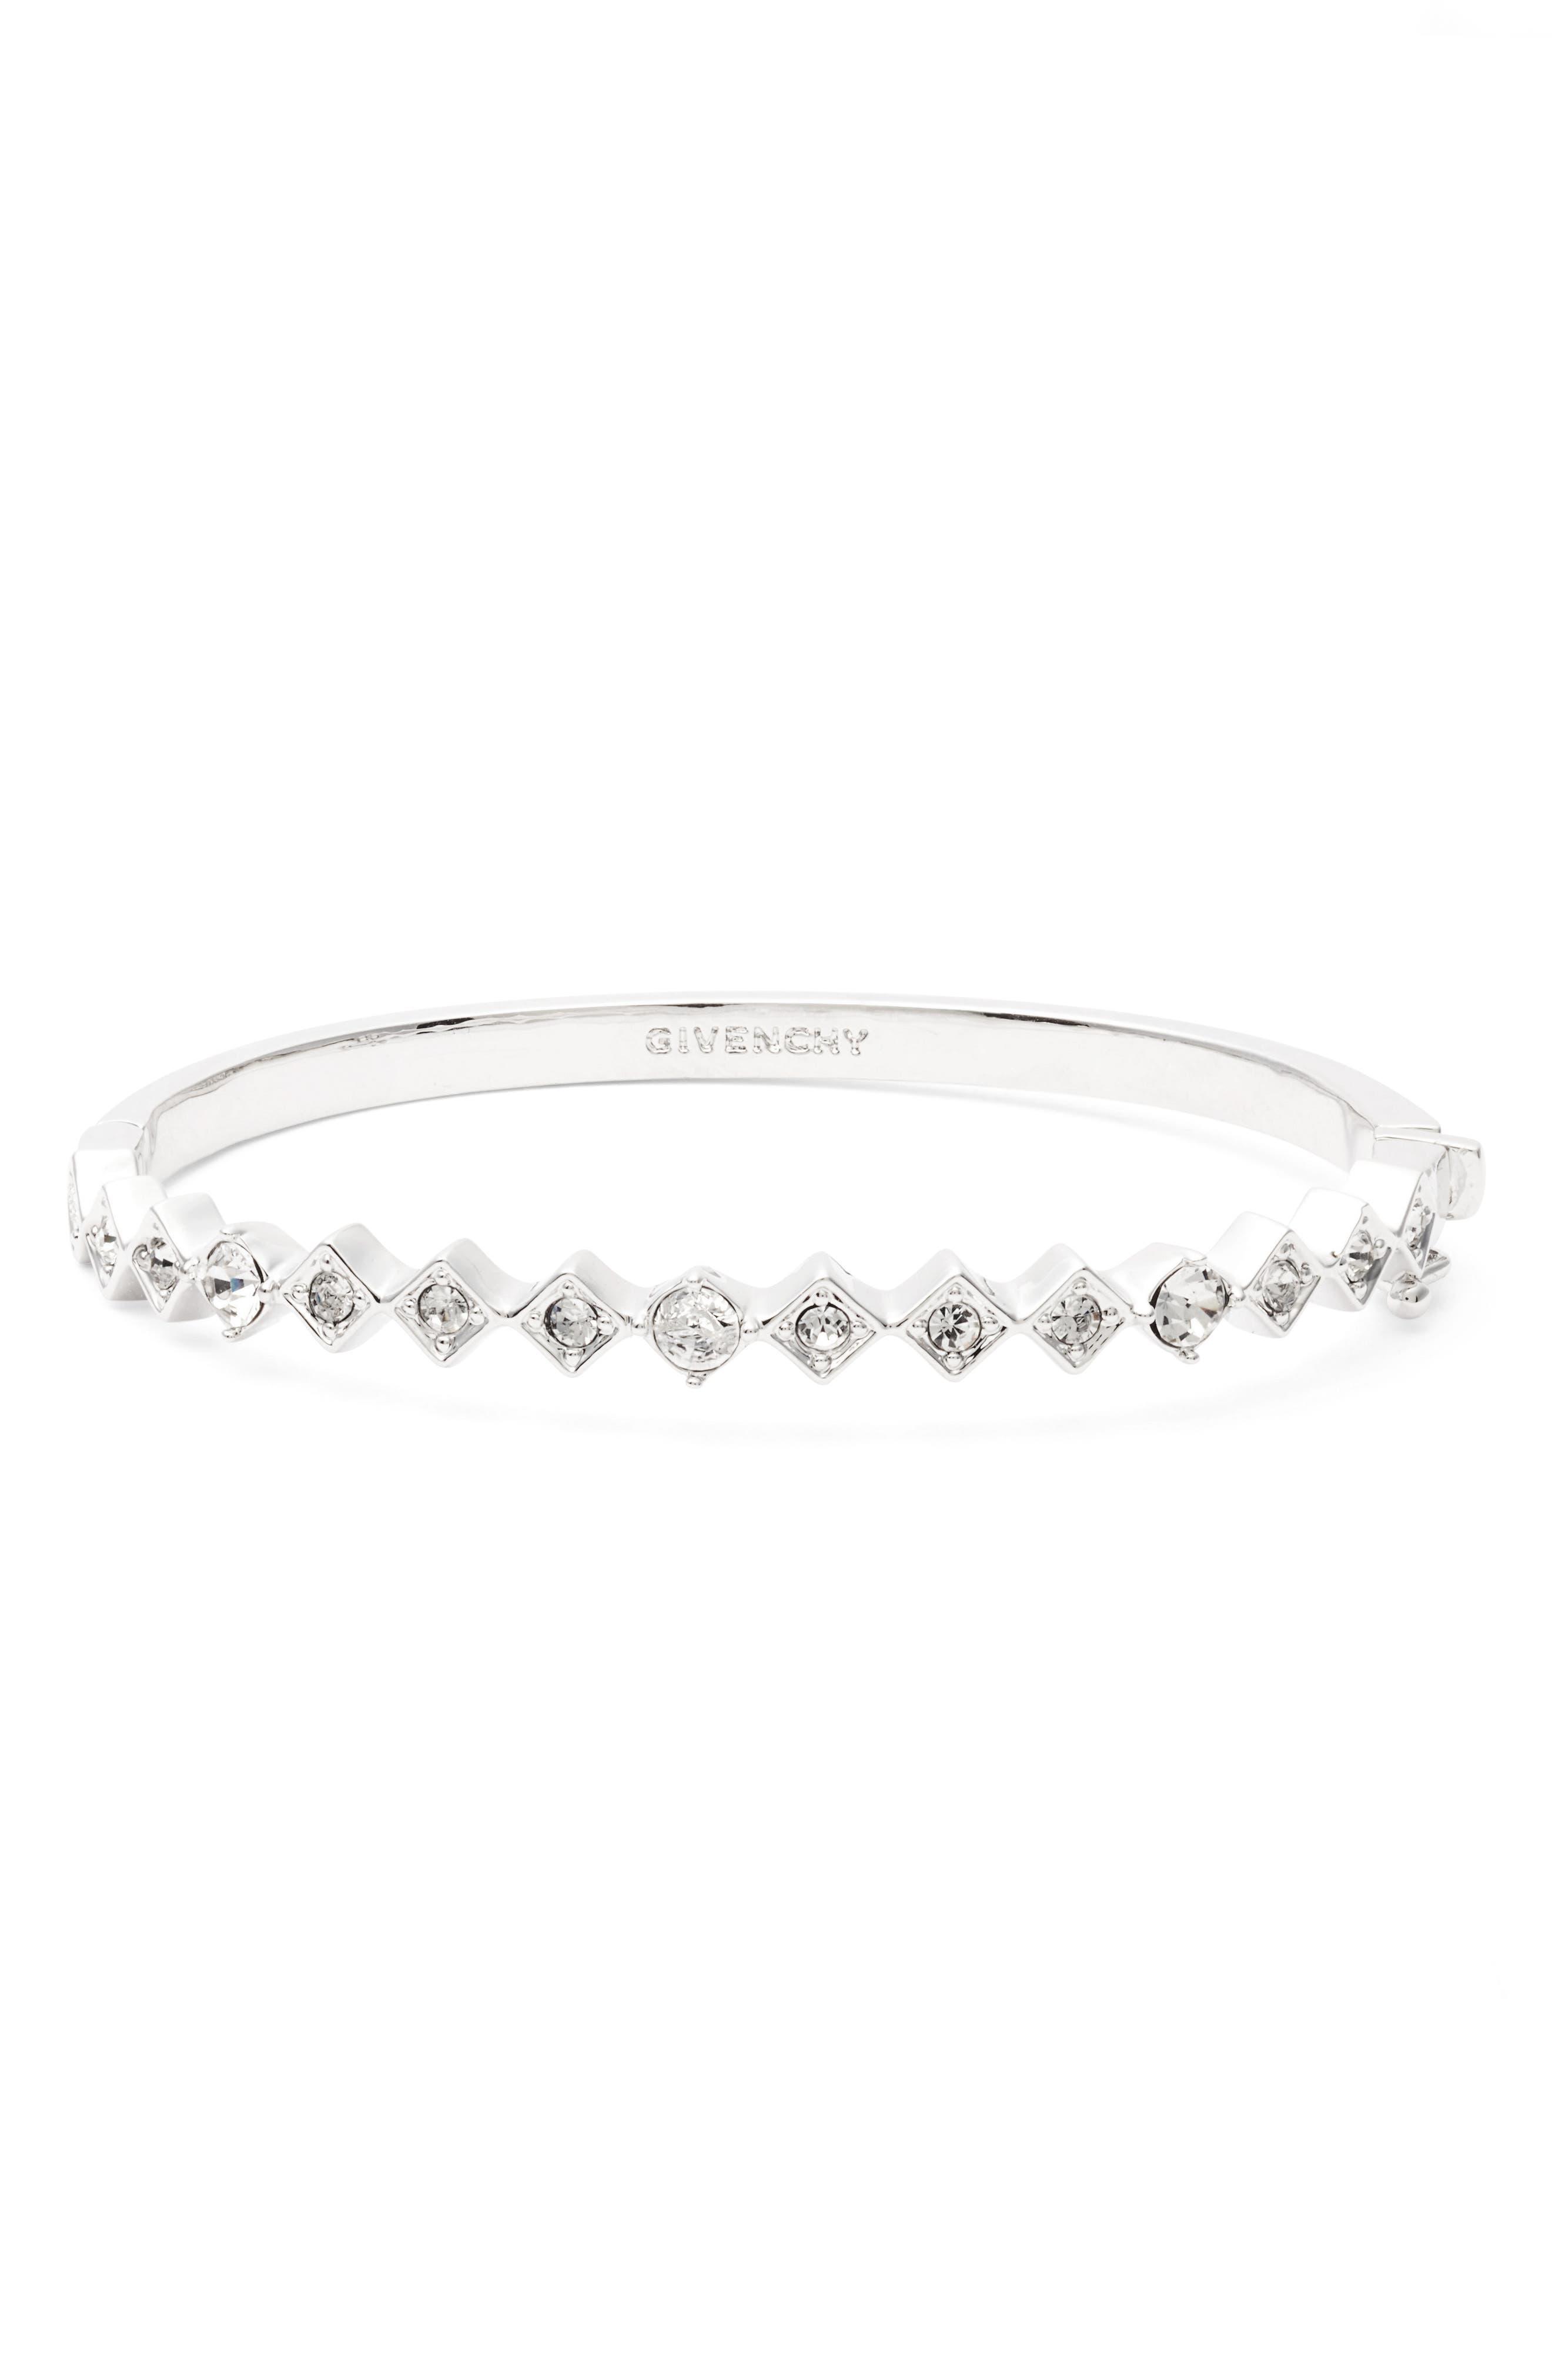 Savannah Crystal Bangle,                         Main,                         color, Clear / Silver